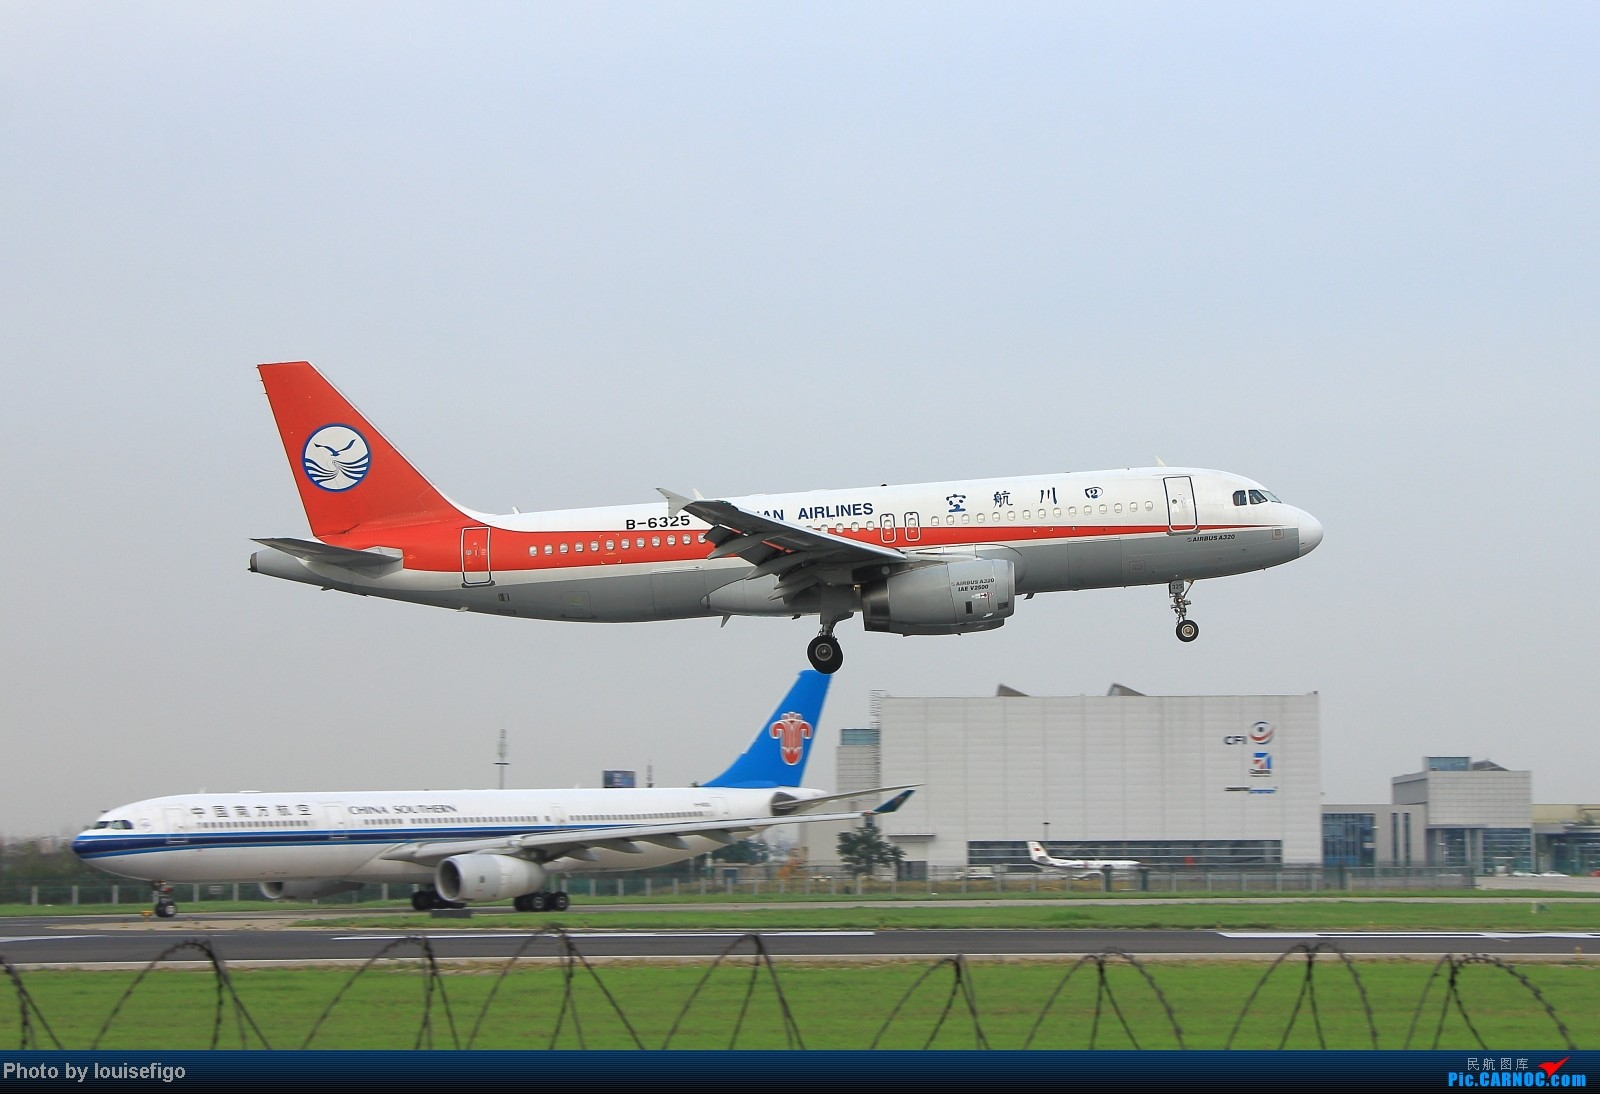 Re:[原创]闲来无事天气闷,发点冷饭自娱乐!!!PEK西跑的降落杂图~发到哪儿是哪儿啊!随心情! AIRBUS A320-200 B-6325 北京首都国际机场